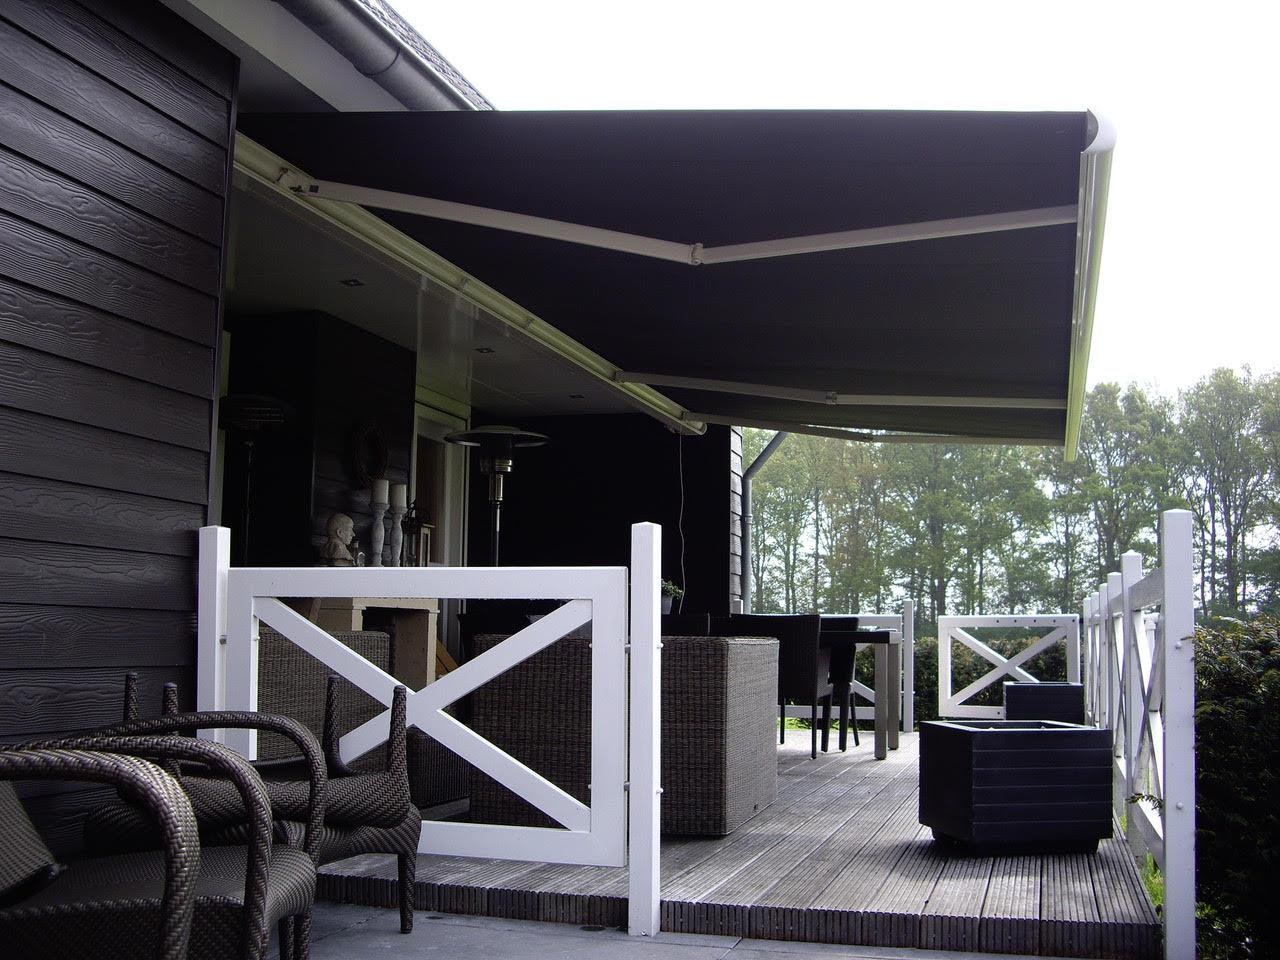 Hulsol - Knikarmscherm - Groenevelt Zonwering & Raamdecoratie